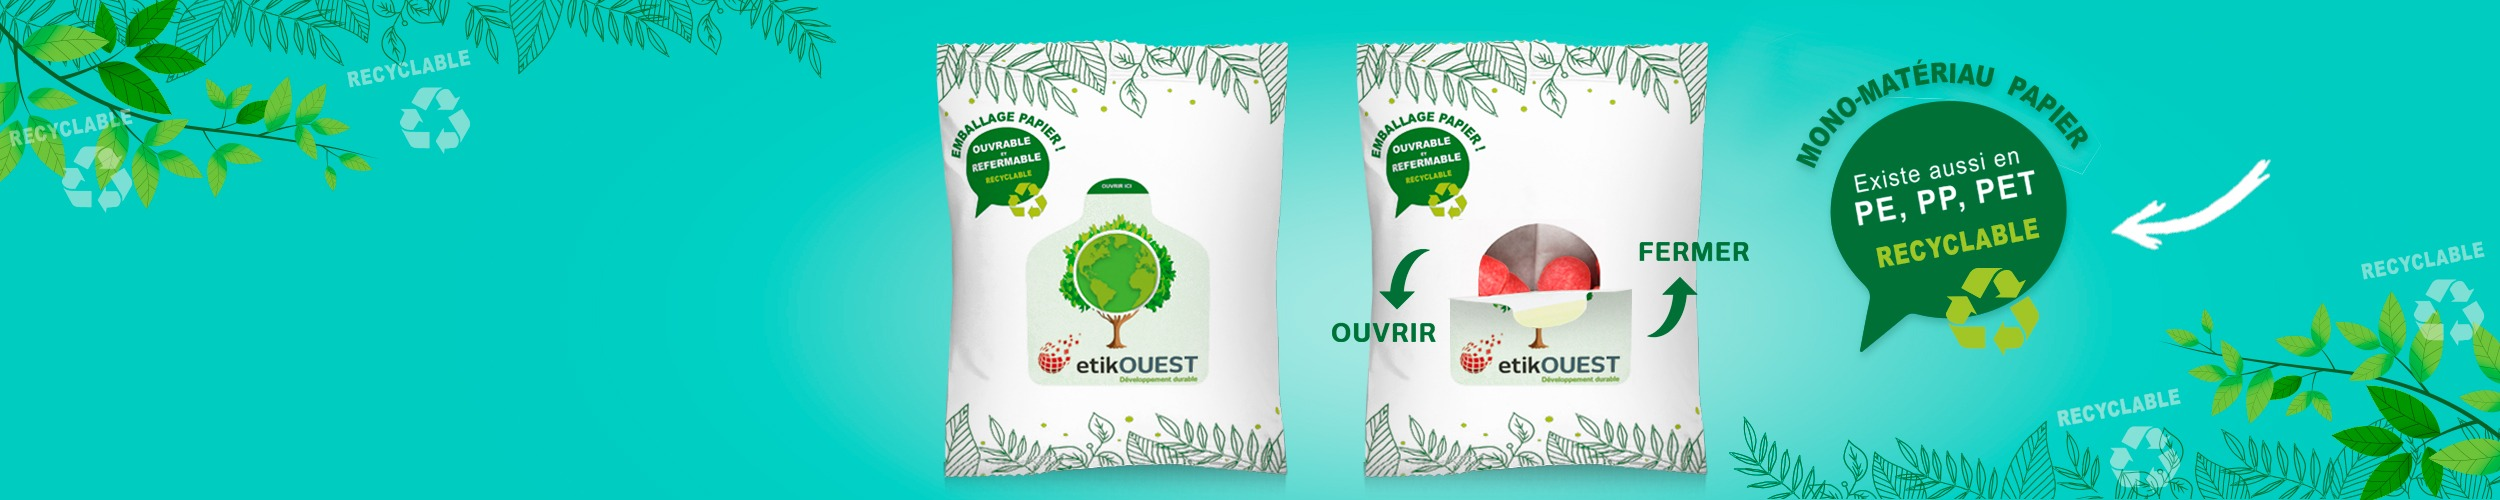 up'n mono-matériau, emballage mono-matériau, Etik Ouest packaging